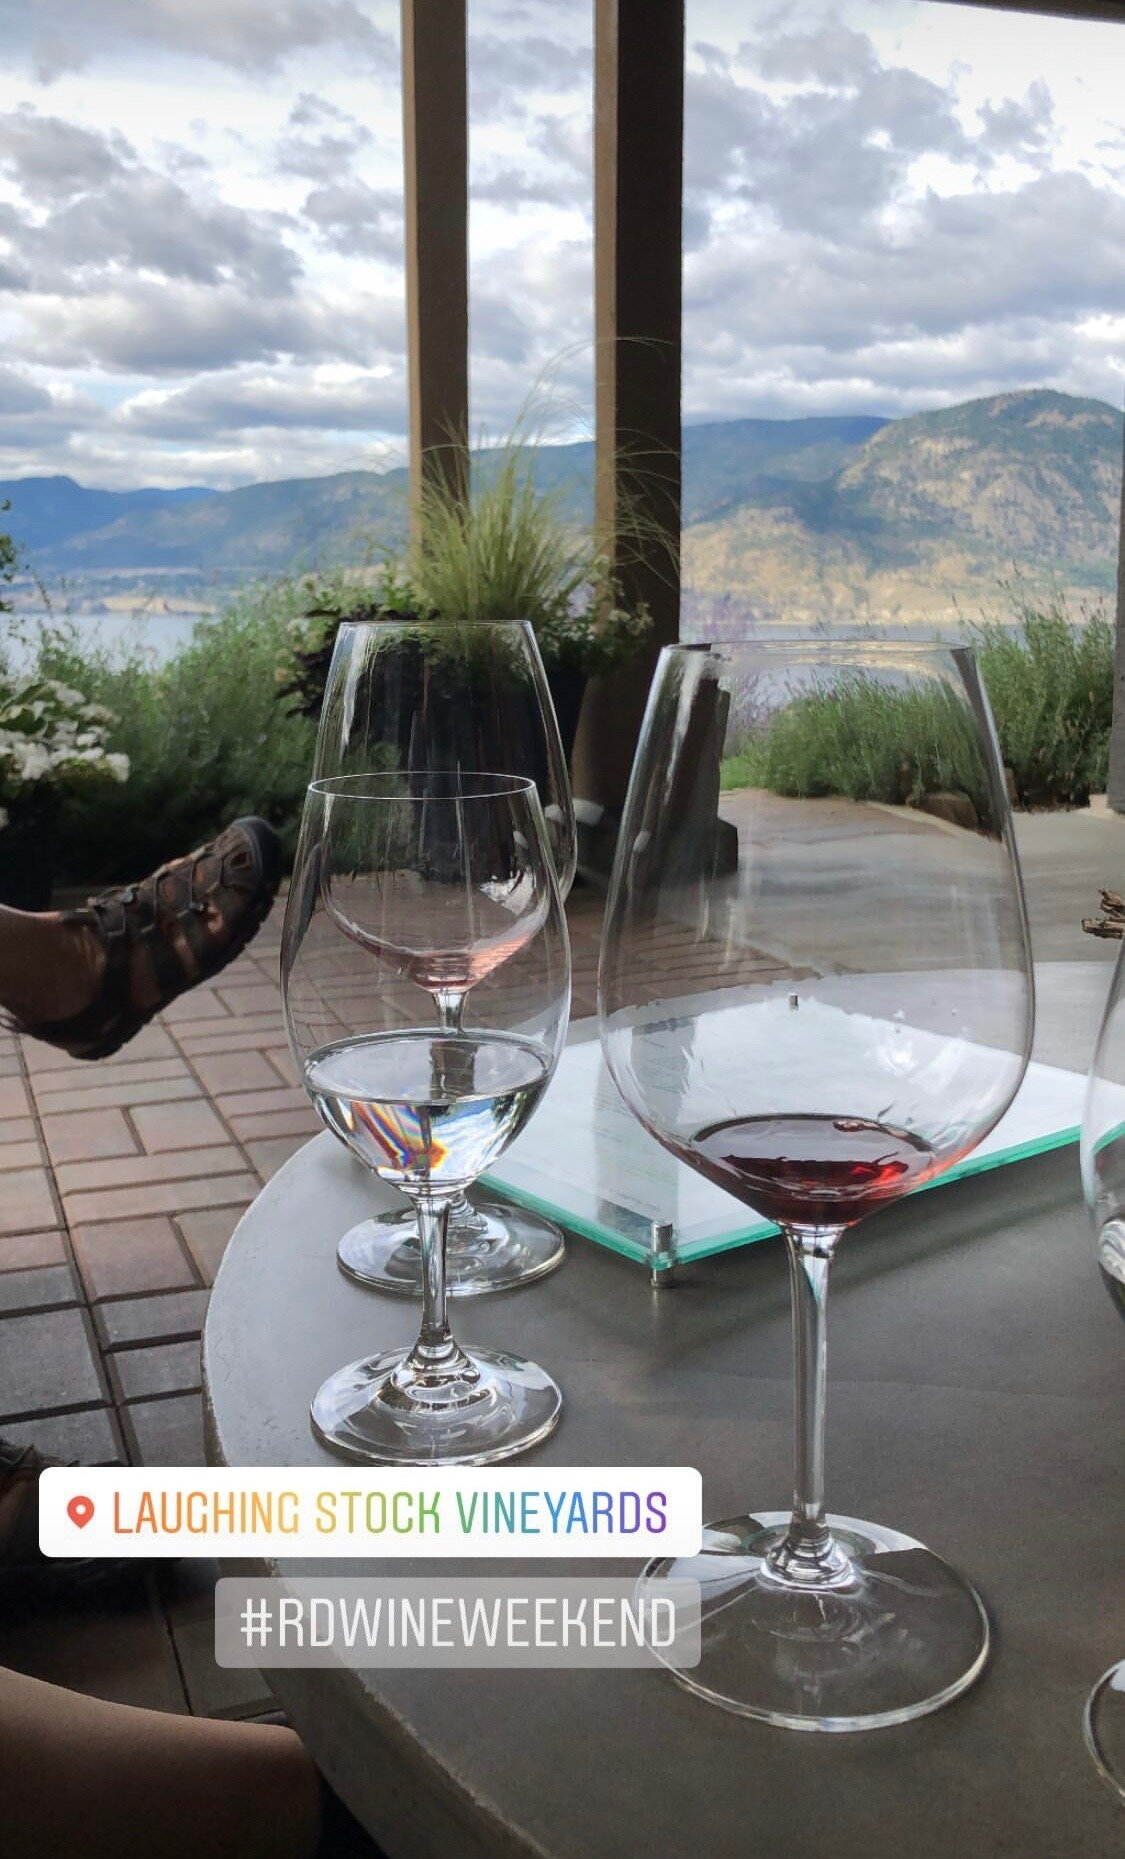 Okanagan wine weekend. Laughing Stock Vineyards.